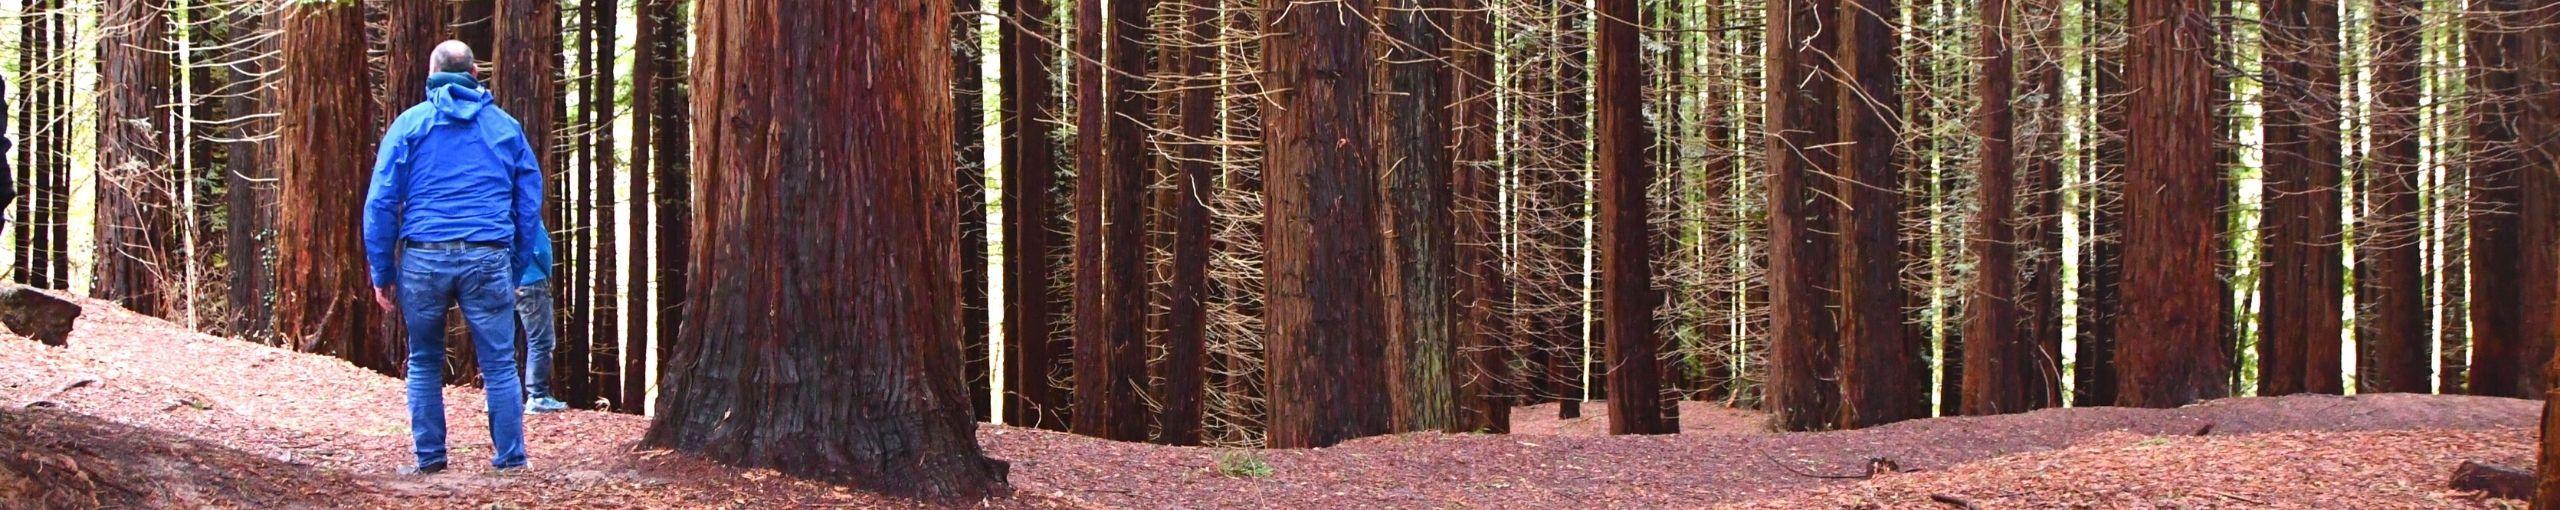 Bosque de Secuoyas. Cabezón de la Sal. Cantabria.